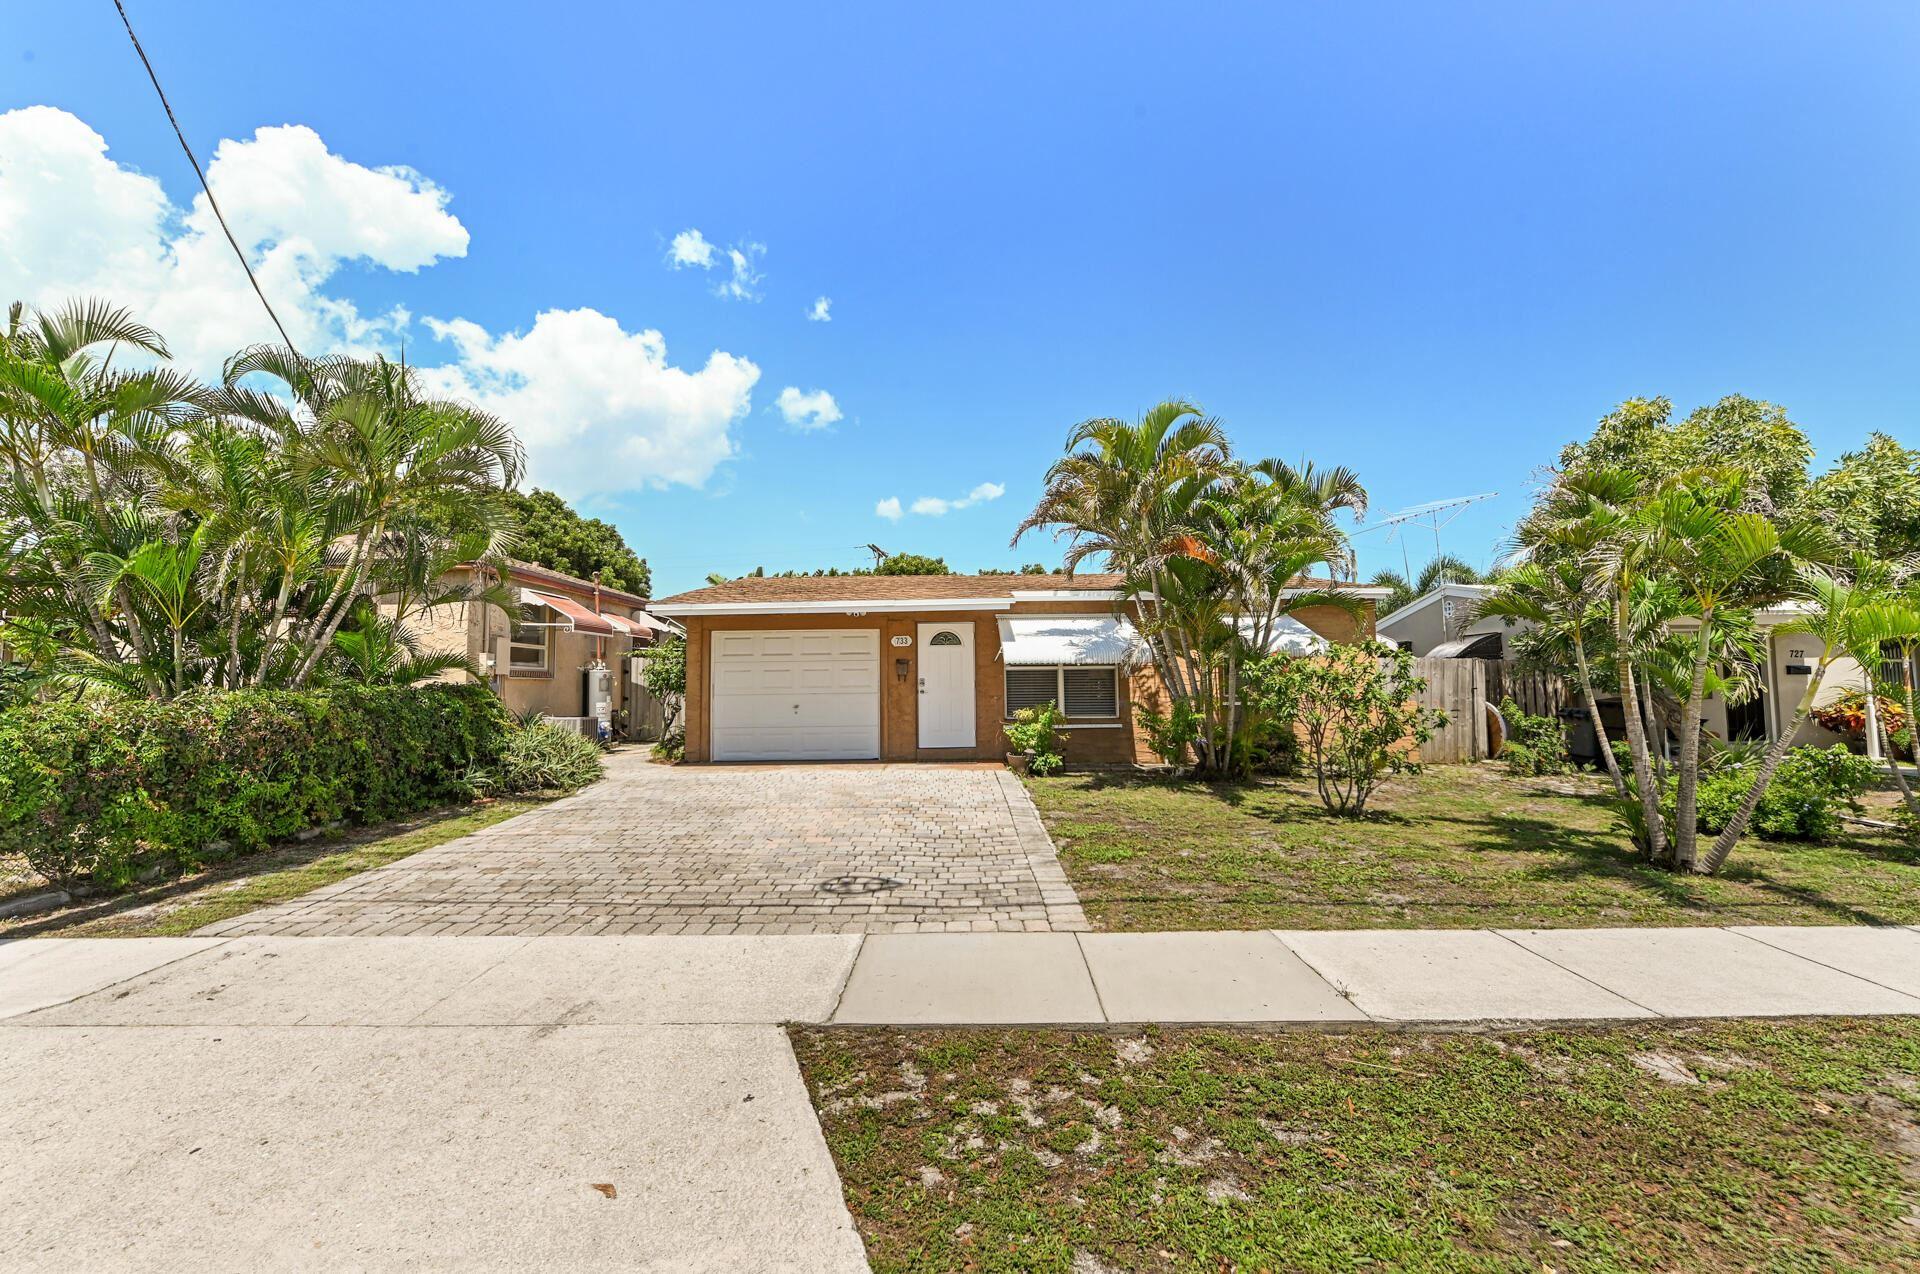 733 Bunker Road, West Palm Beach, FL 33405 - MLS#: RX-10744583